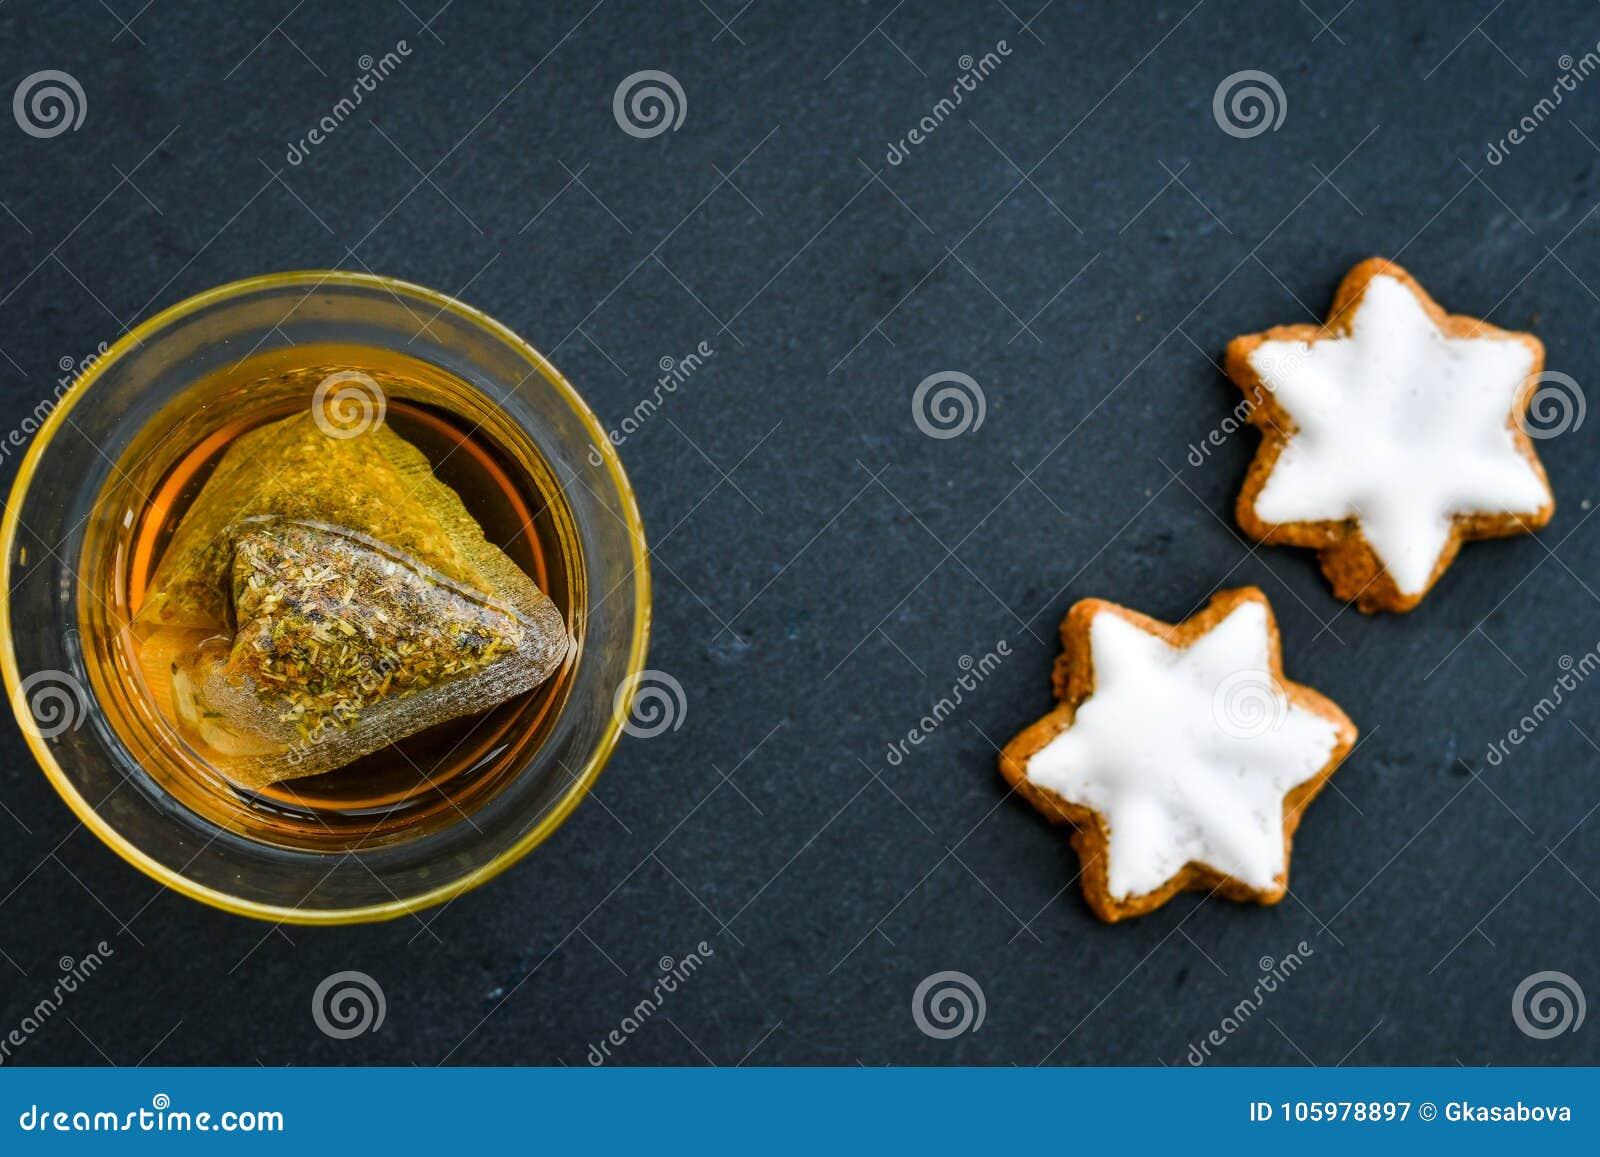 Biscoitos e chá